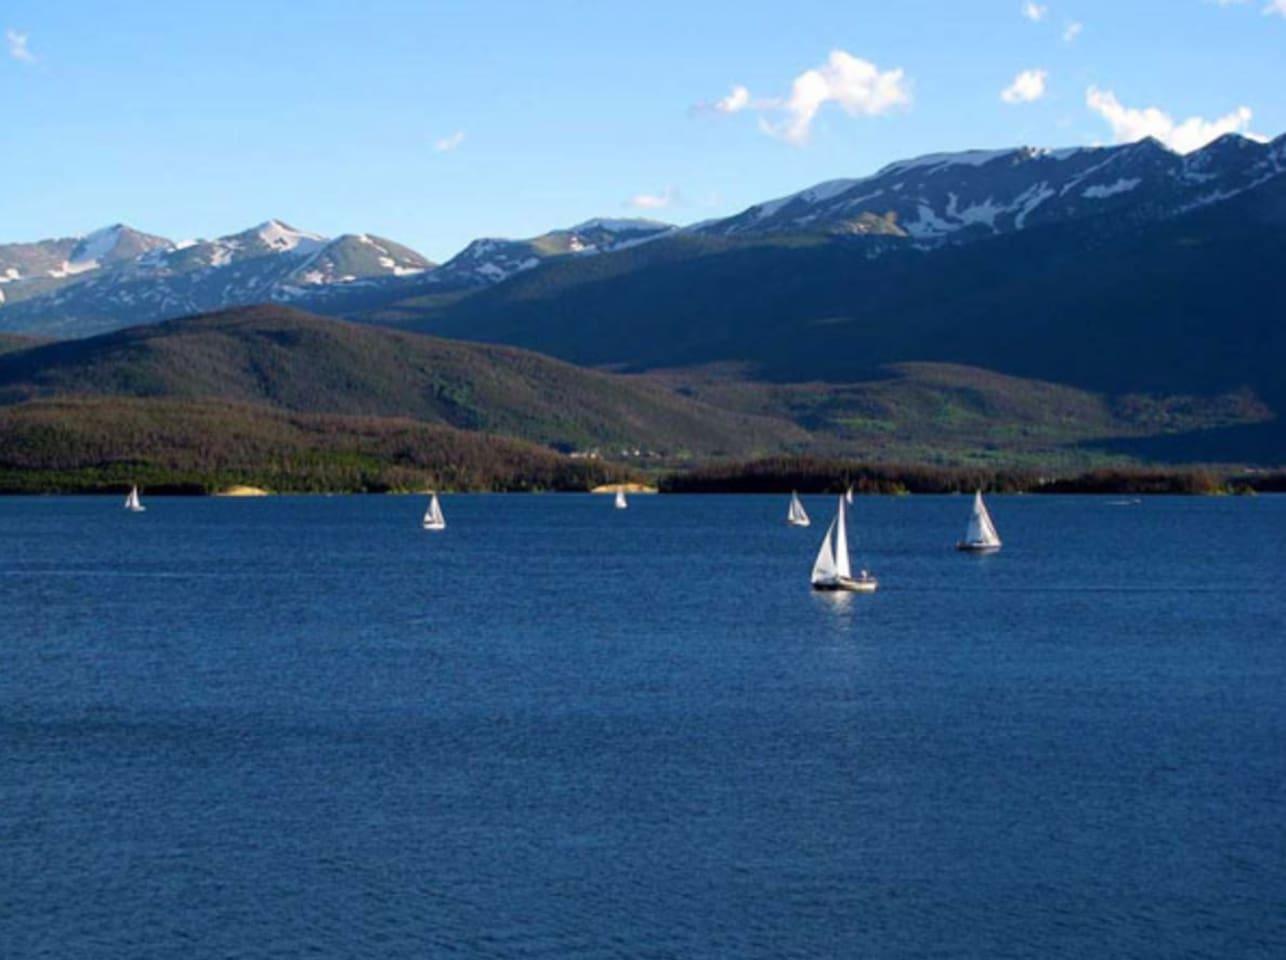 2 minute walk to the Lake Dillon!